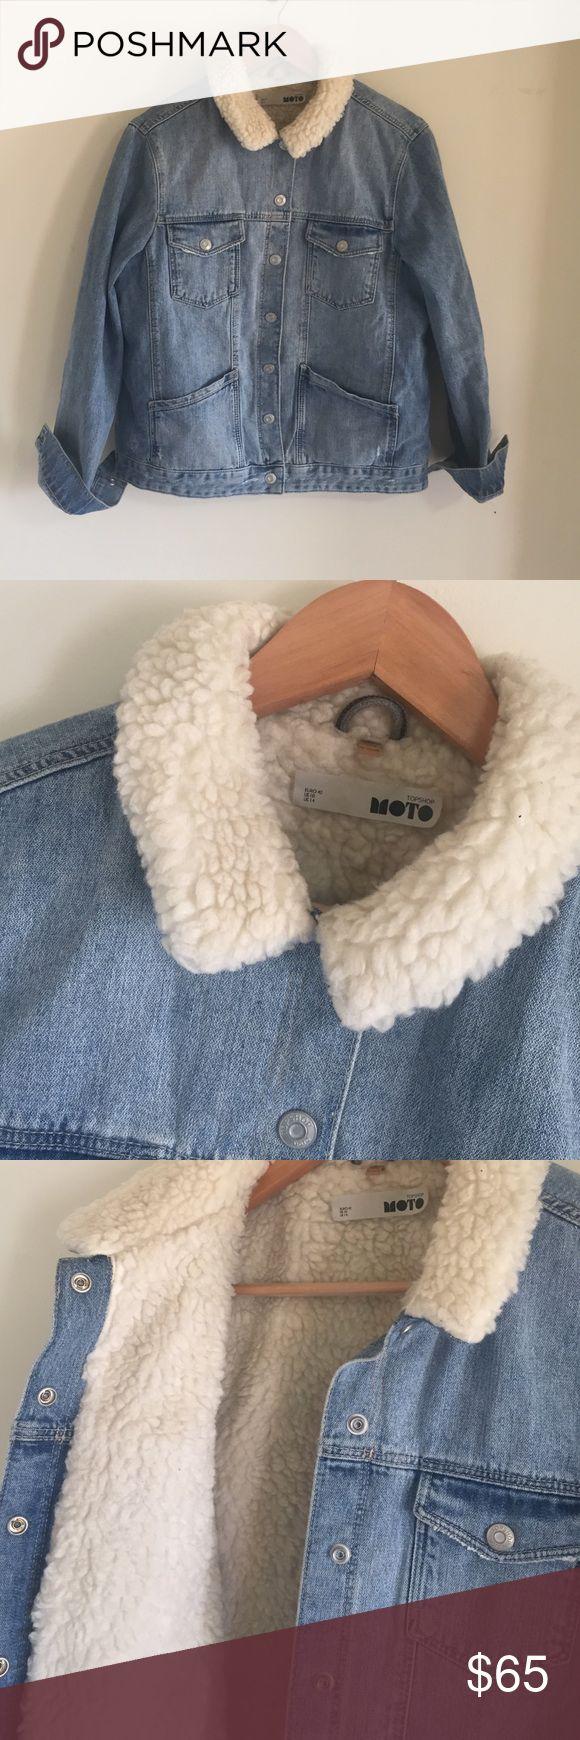 TopShop Fur denim jacket. Moto collection 😎 Great Condition. No fur along sleeves so perfect for layering. Topshop Jackets & Coats